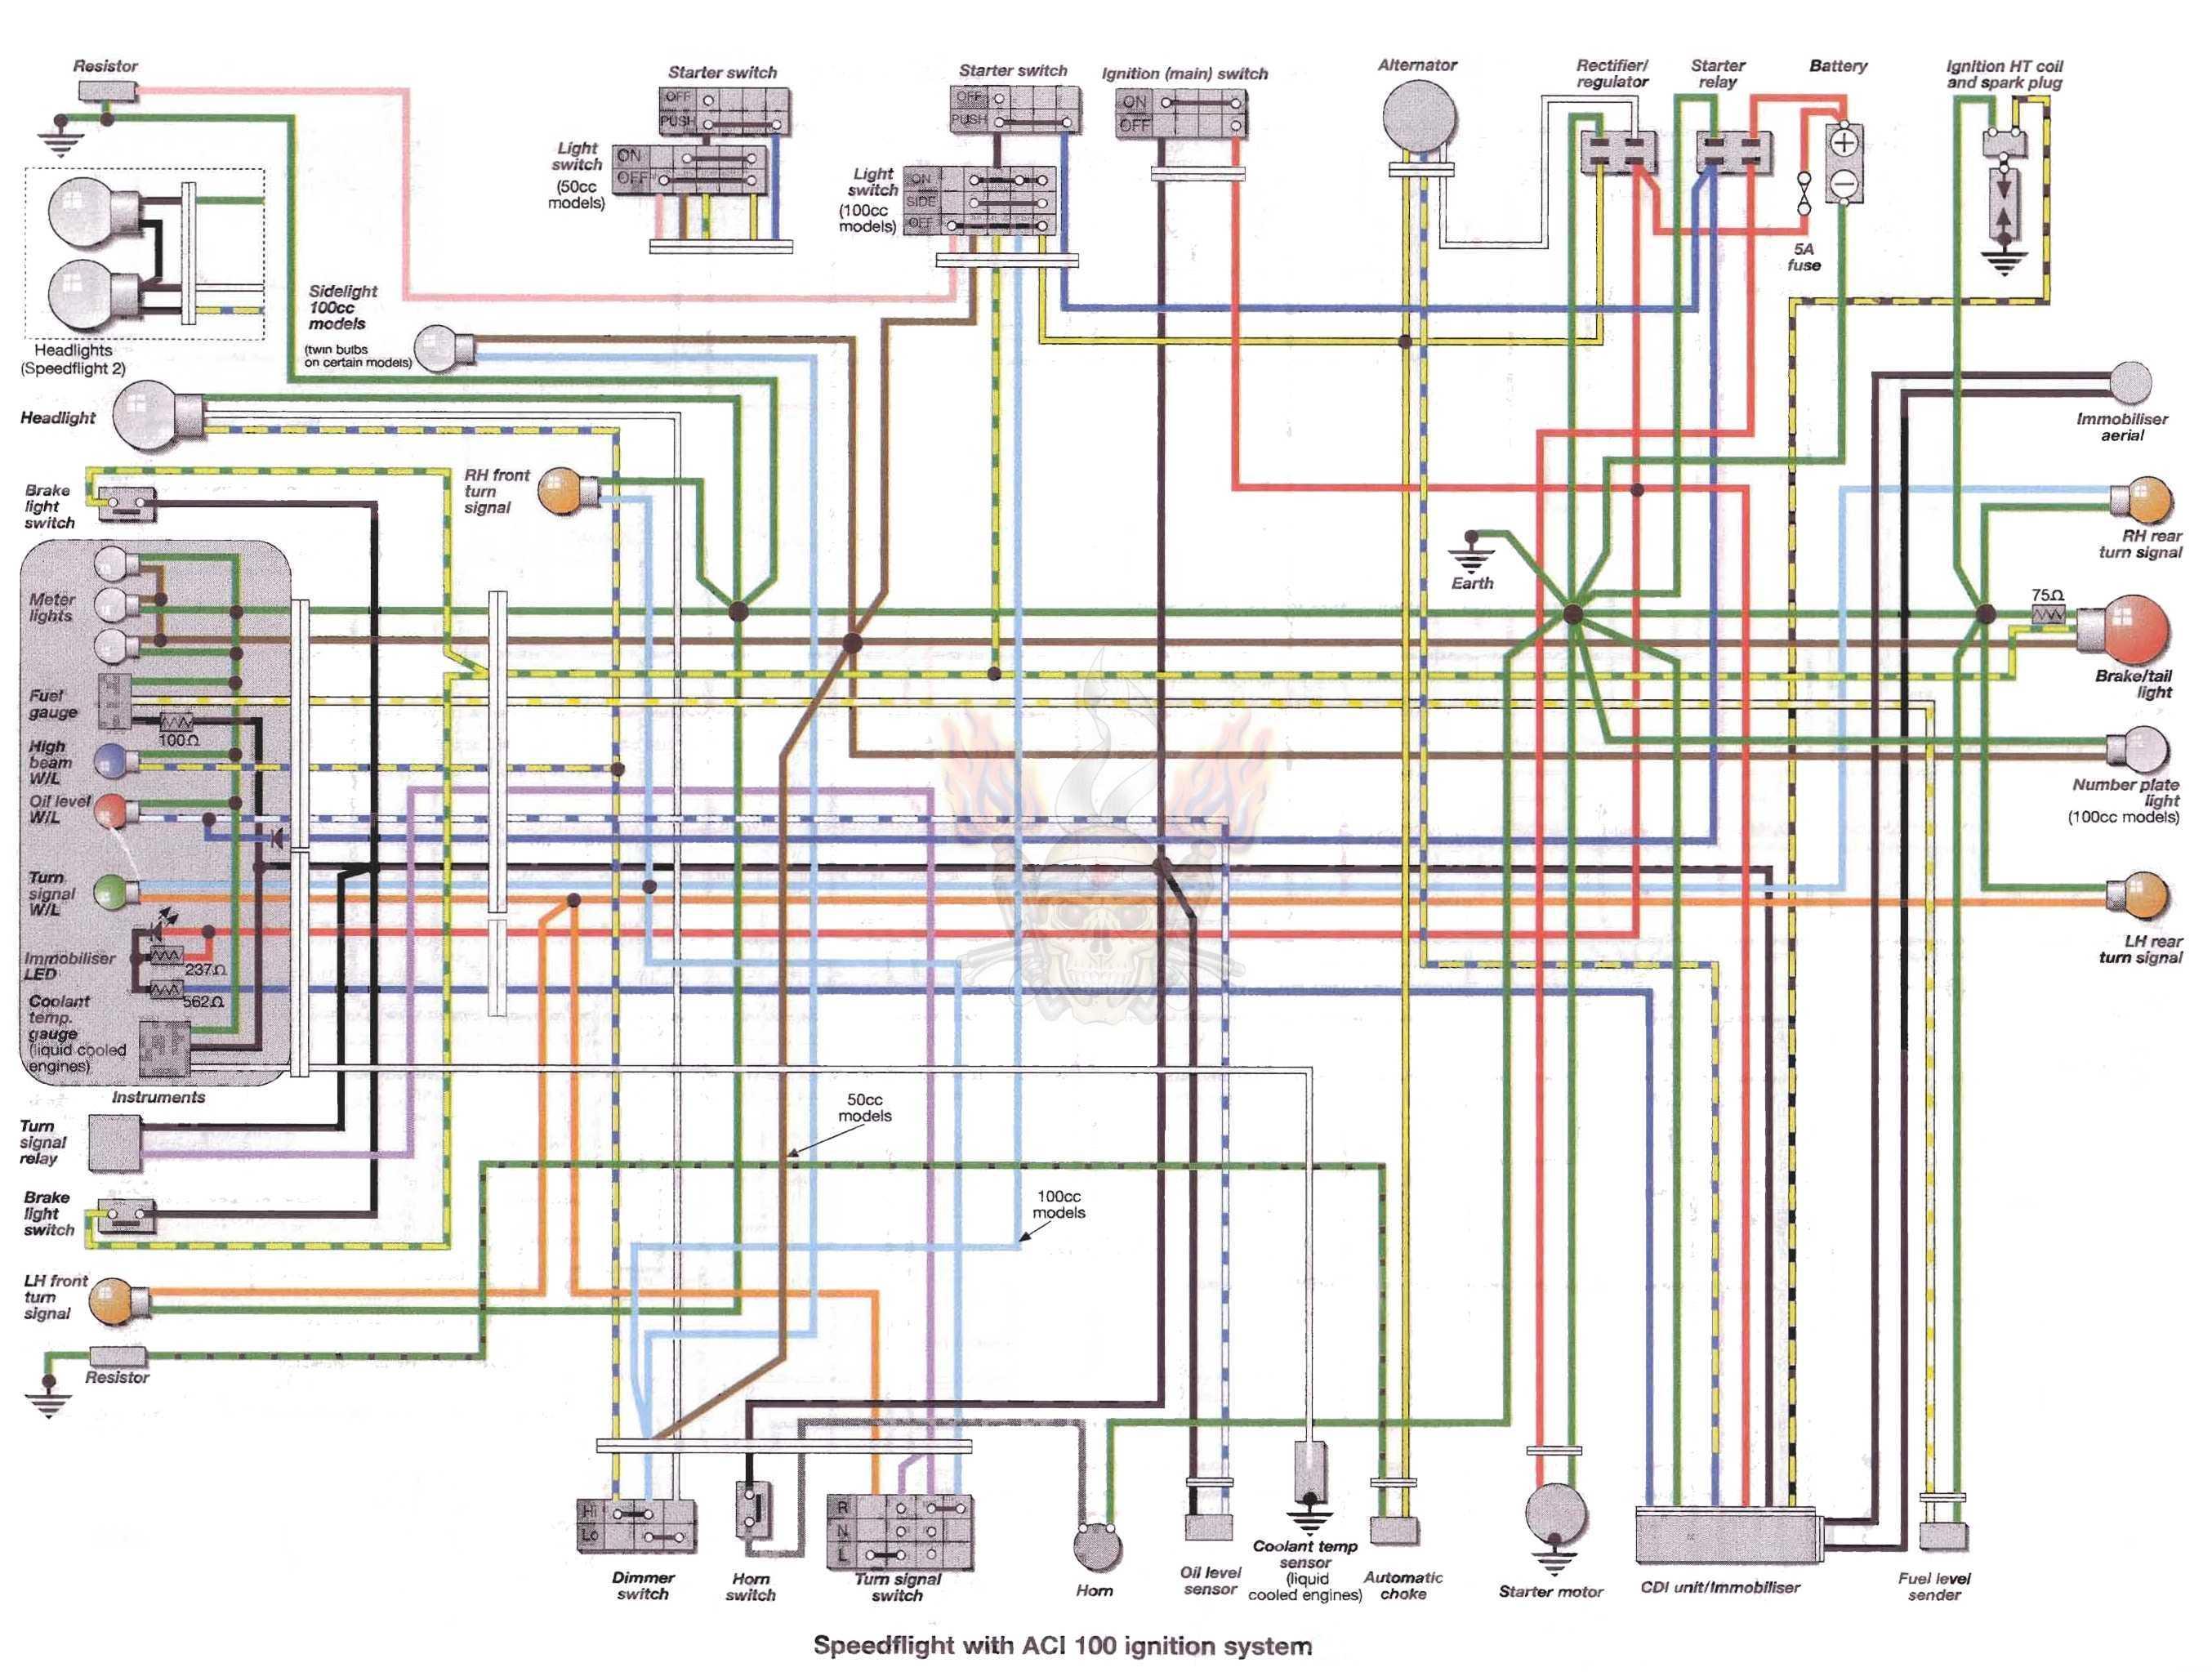 Incredible Peugeot Wiring Diagrams Mopedwiki Basic Electronics Wiring Diagram Wiring Digital Resources Talizslowmaporg